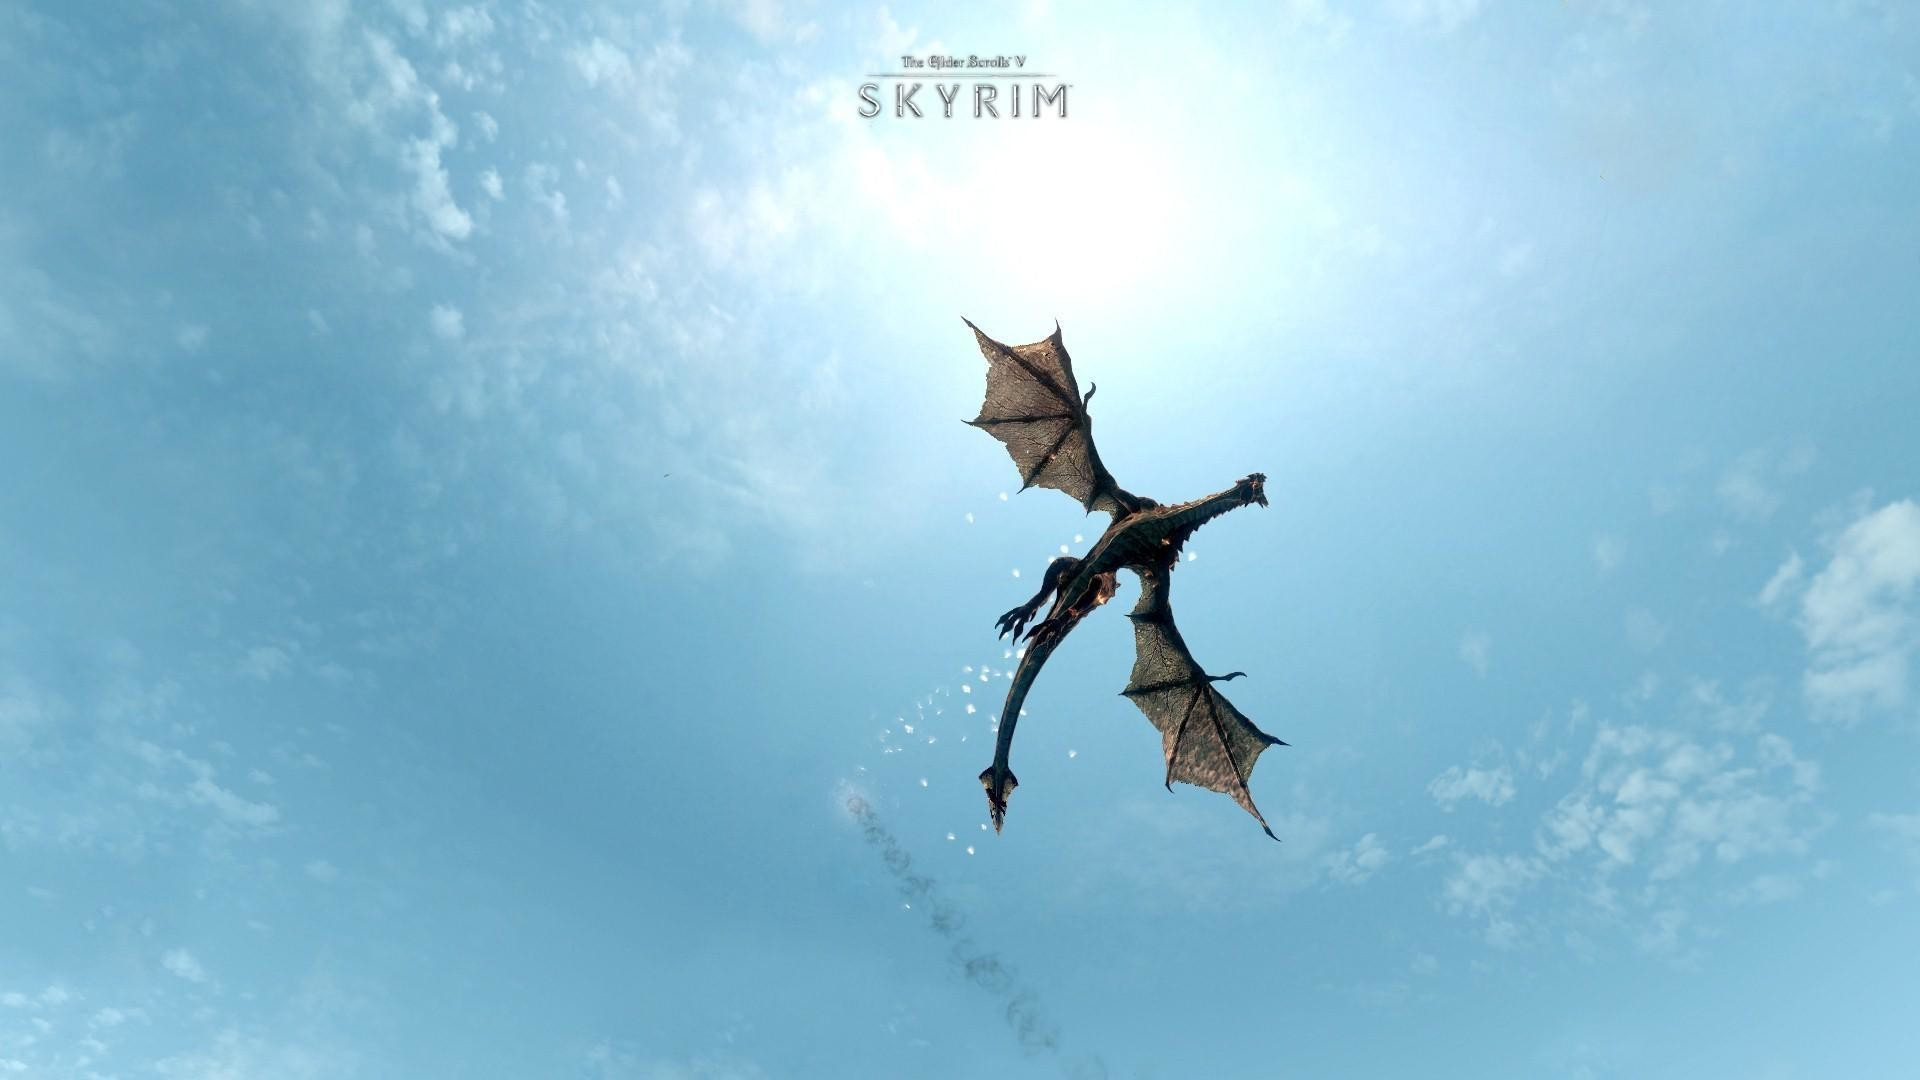 Skyrim Dragon Wallpaper 67 Images